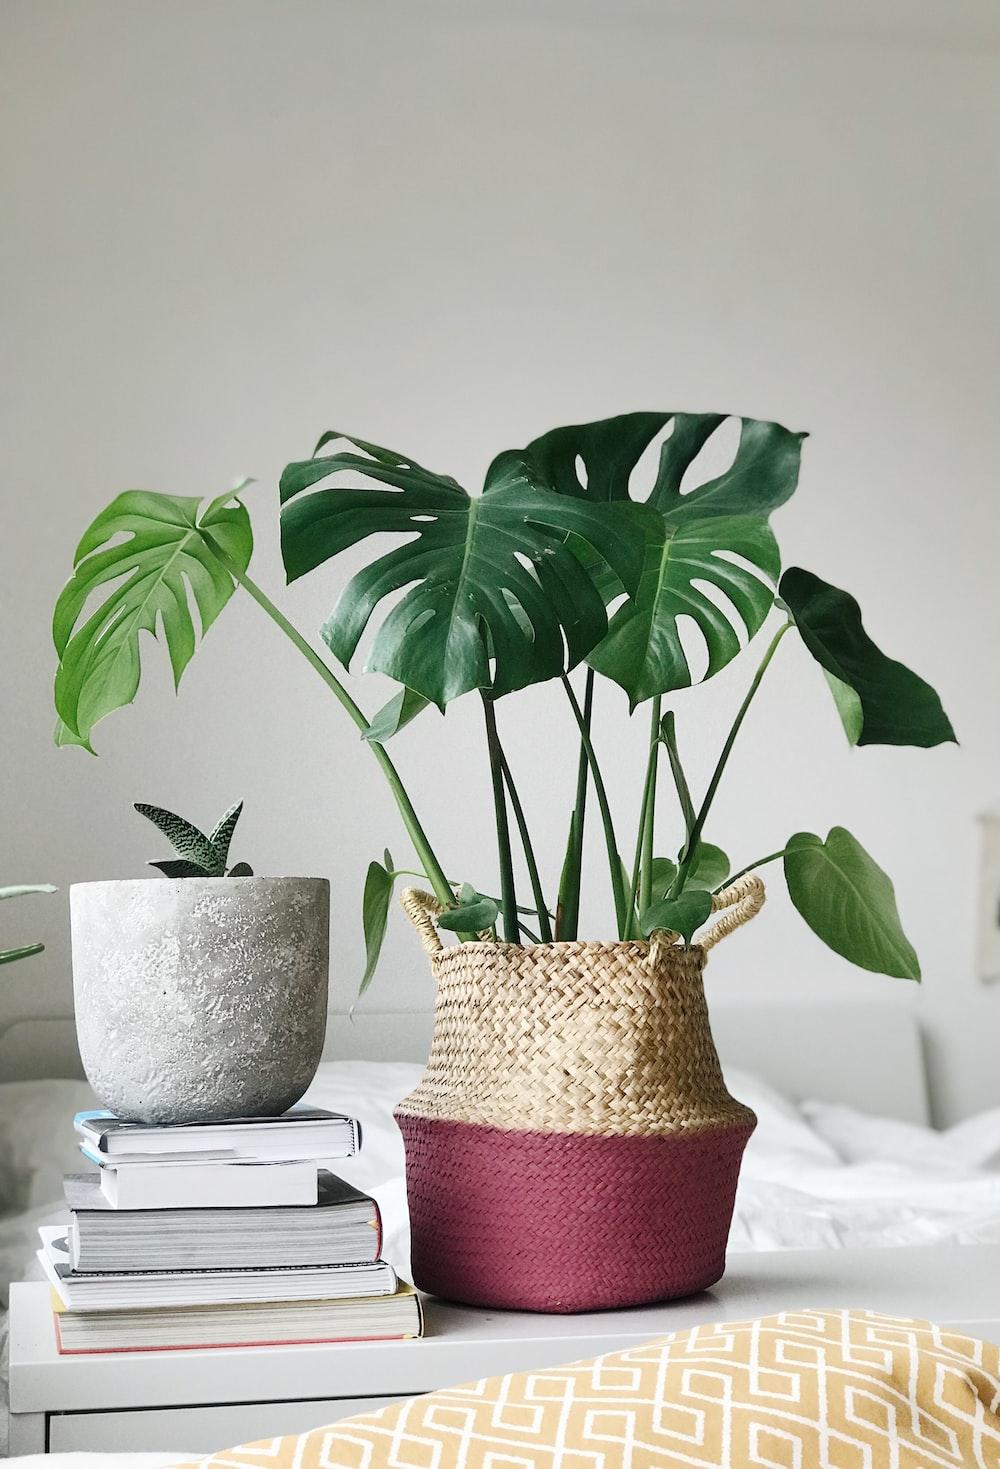 green leaf plant in brown wicker vase near books